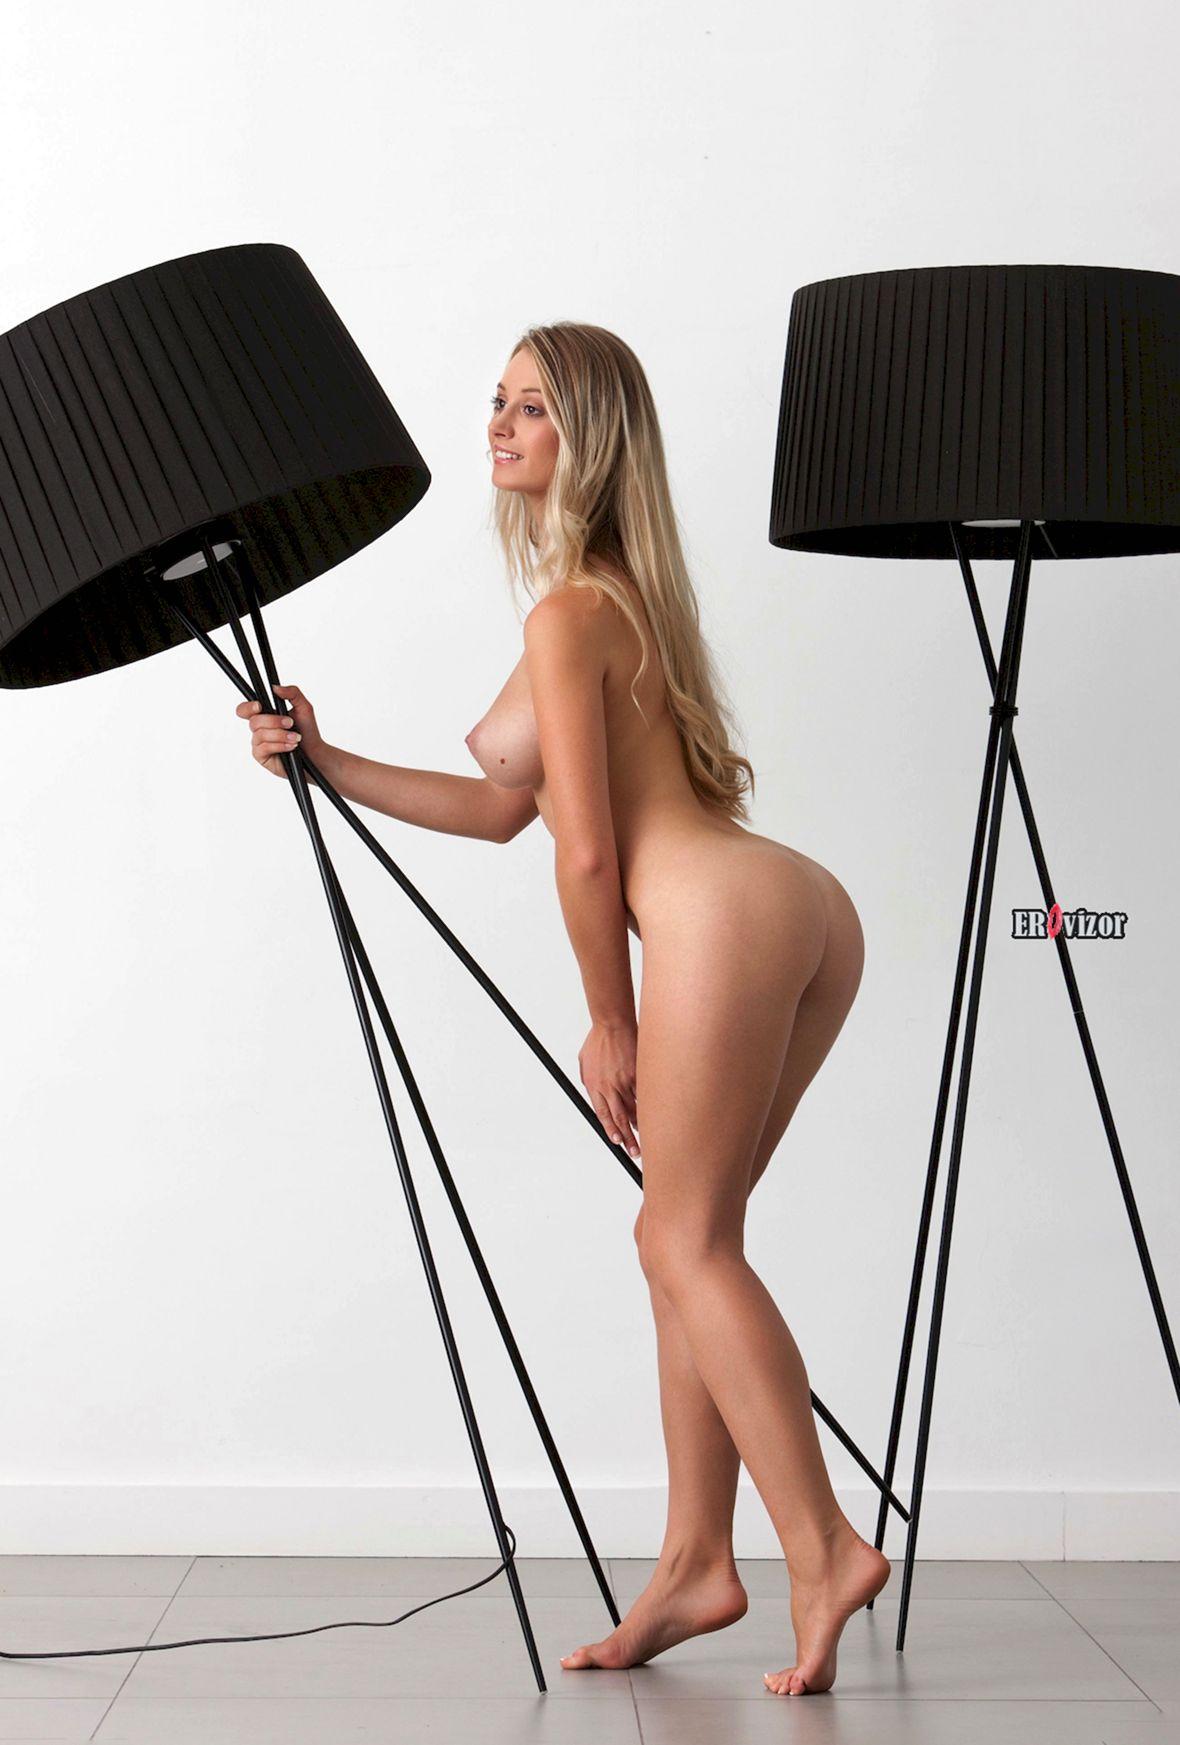 Blonde-Babe-Carisha-with-Big-Tits (9)